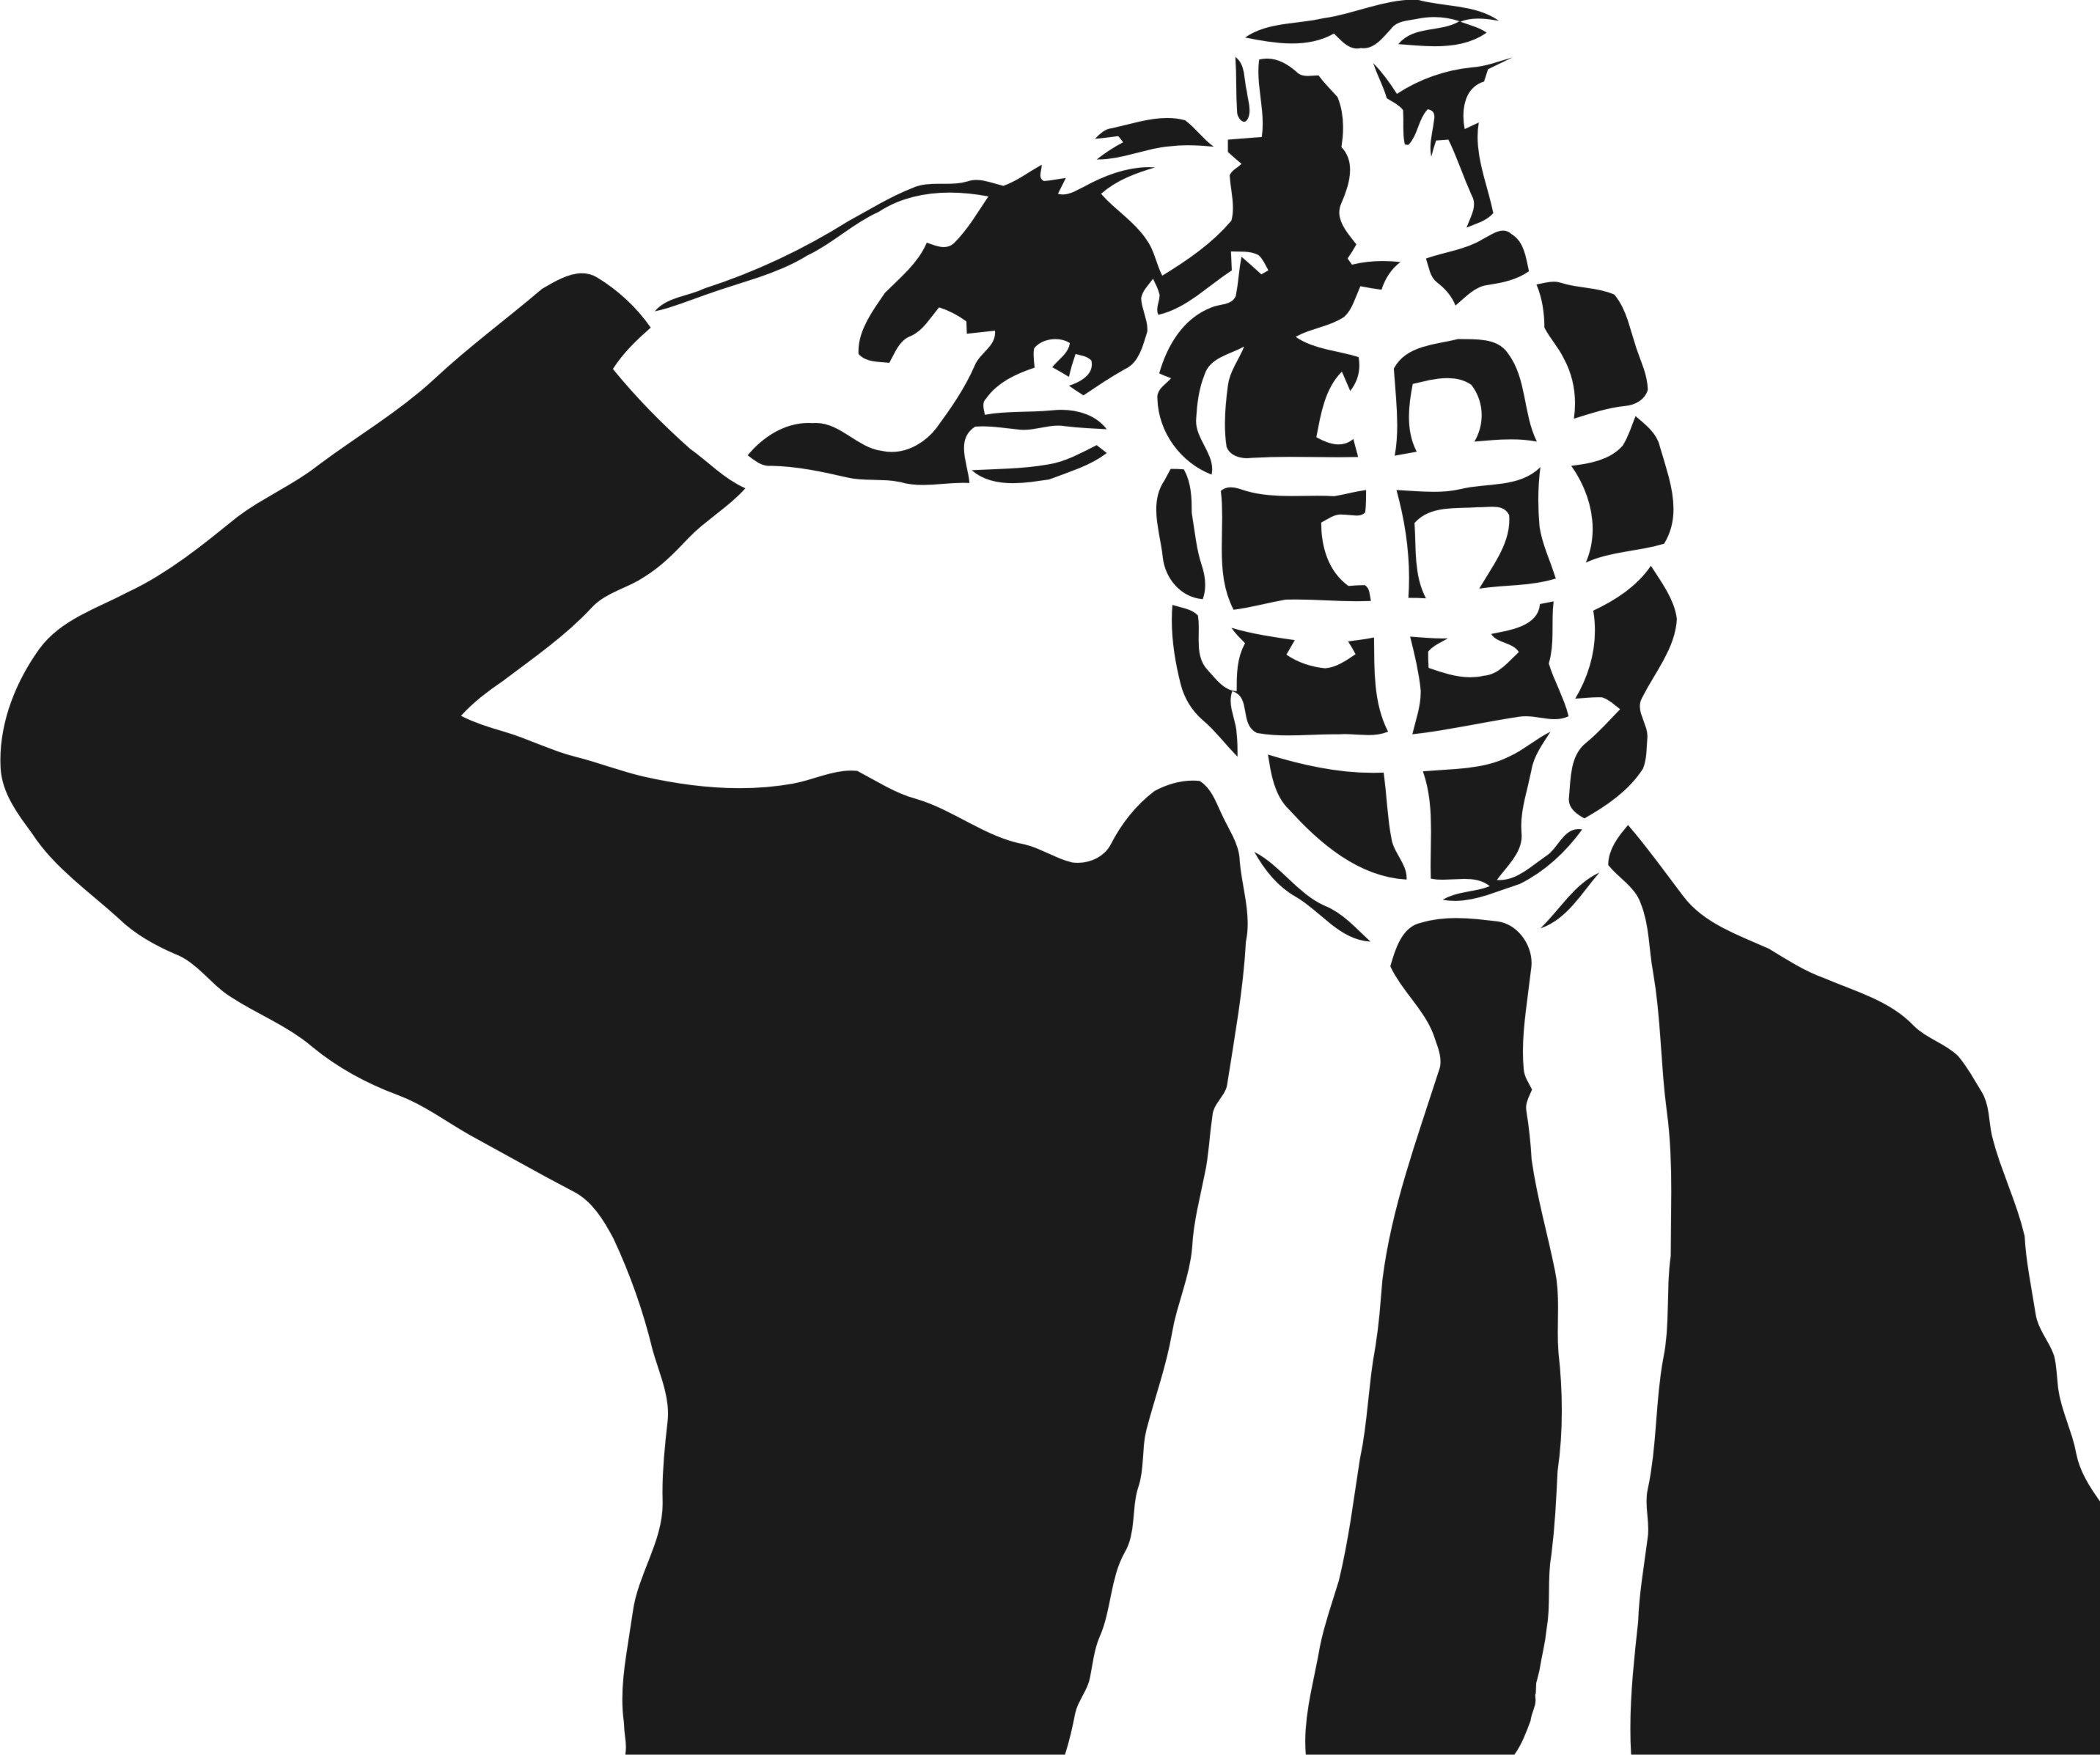 Drawn grenade black and white Fonseca's Carlos  Magazine 3:AM